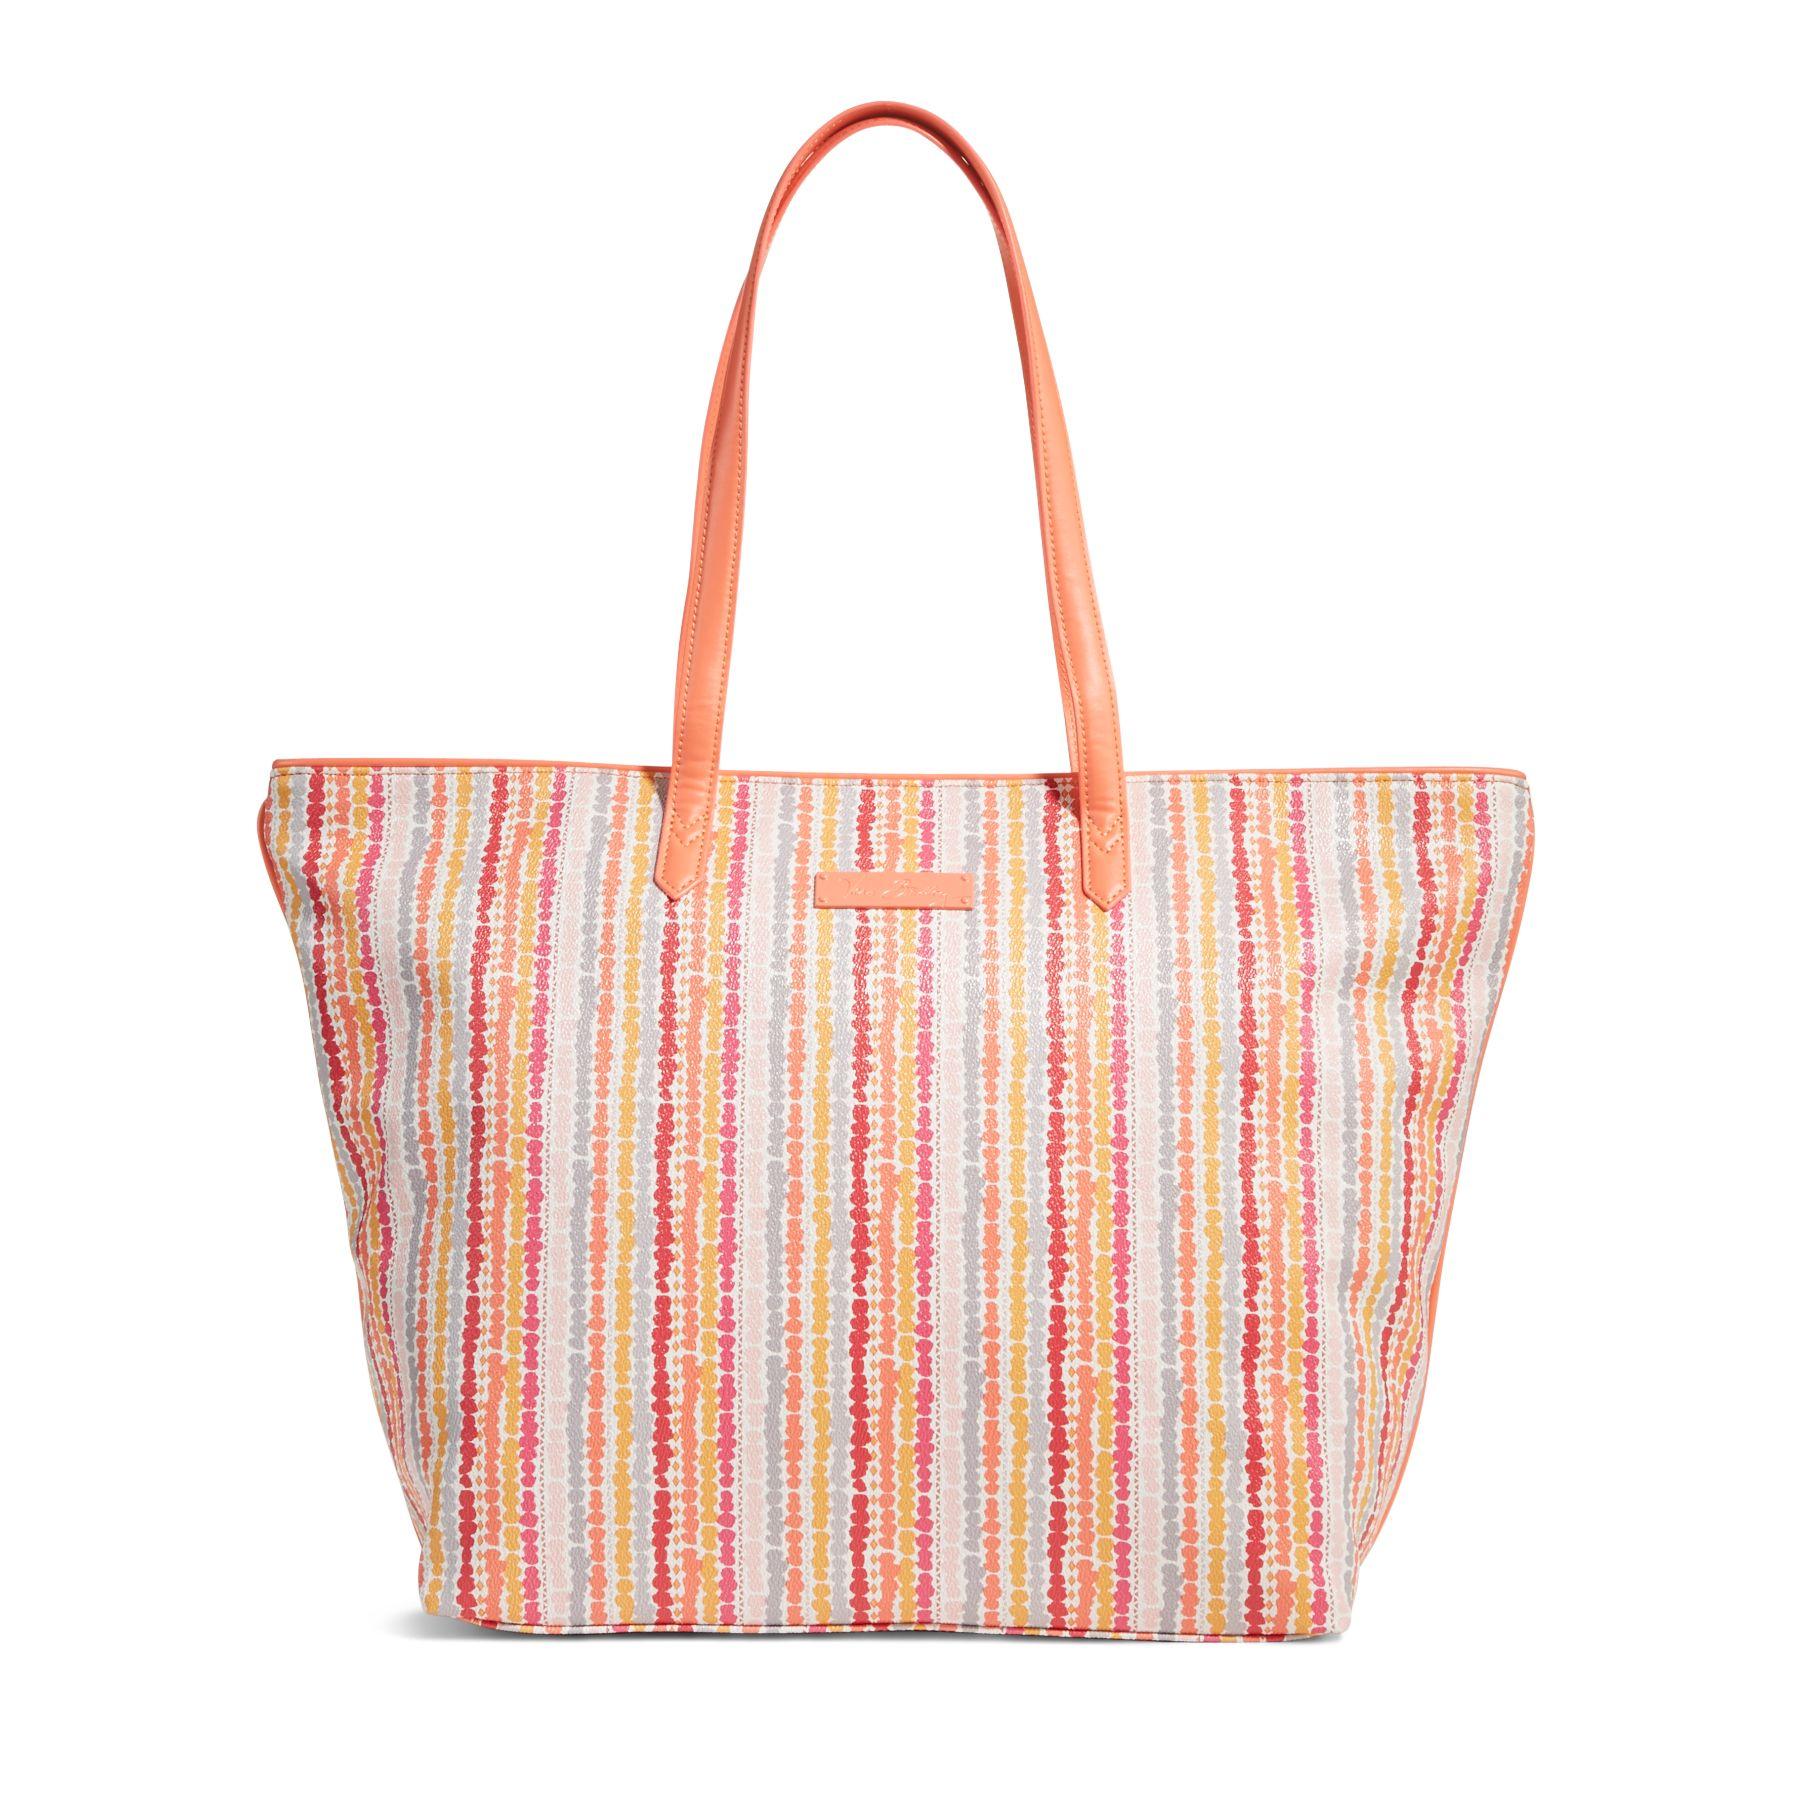 Vera Bradley Big Tote Bag